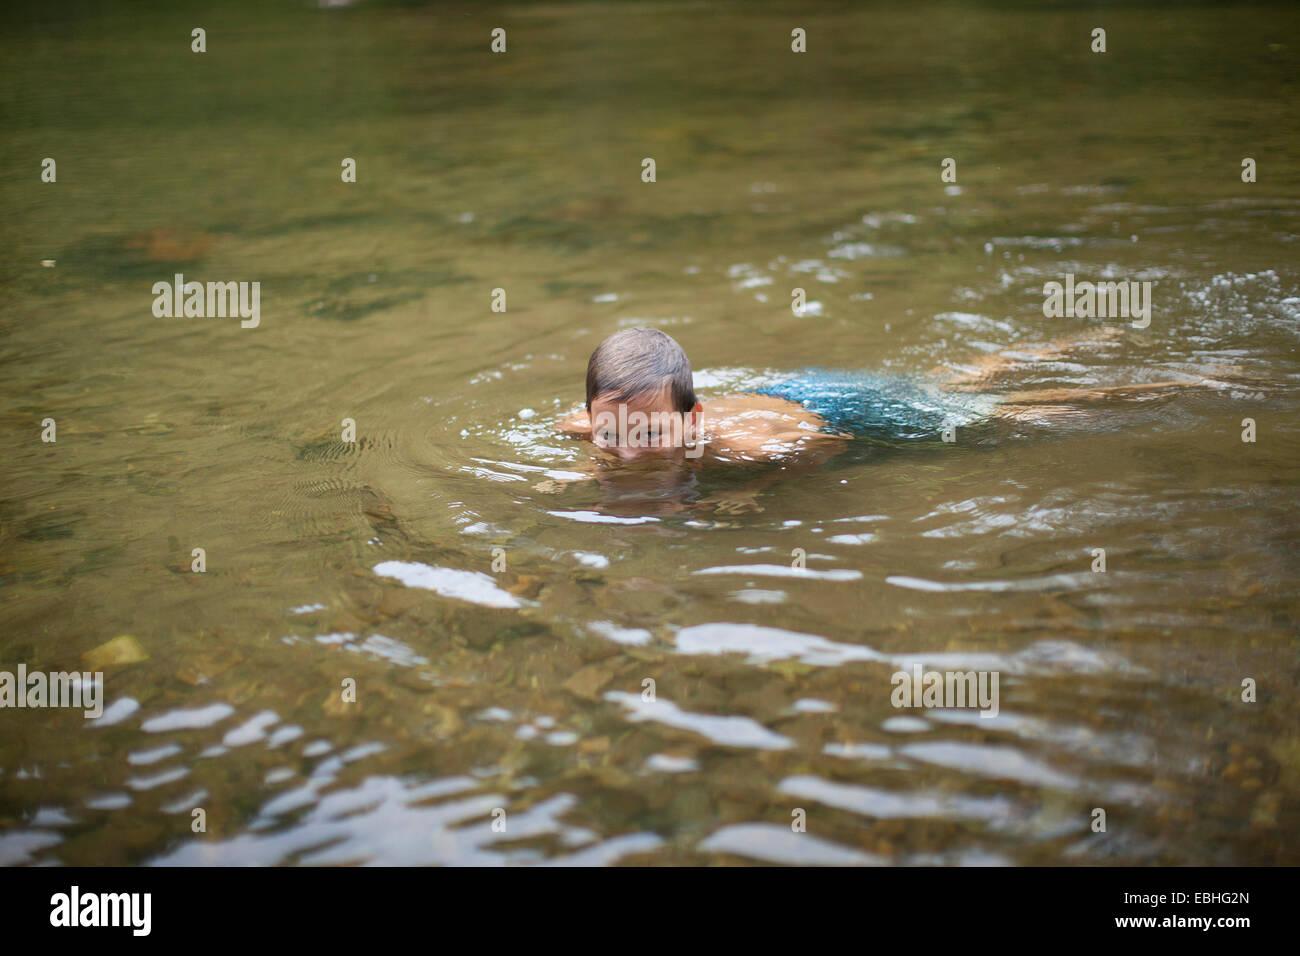 Teenage boy submerged in river, Canton, North Carolina, USA - Stock Image